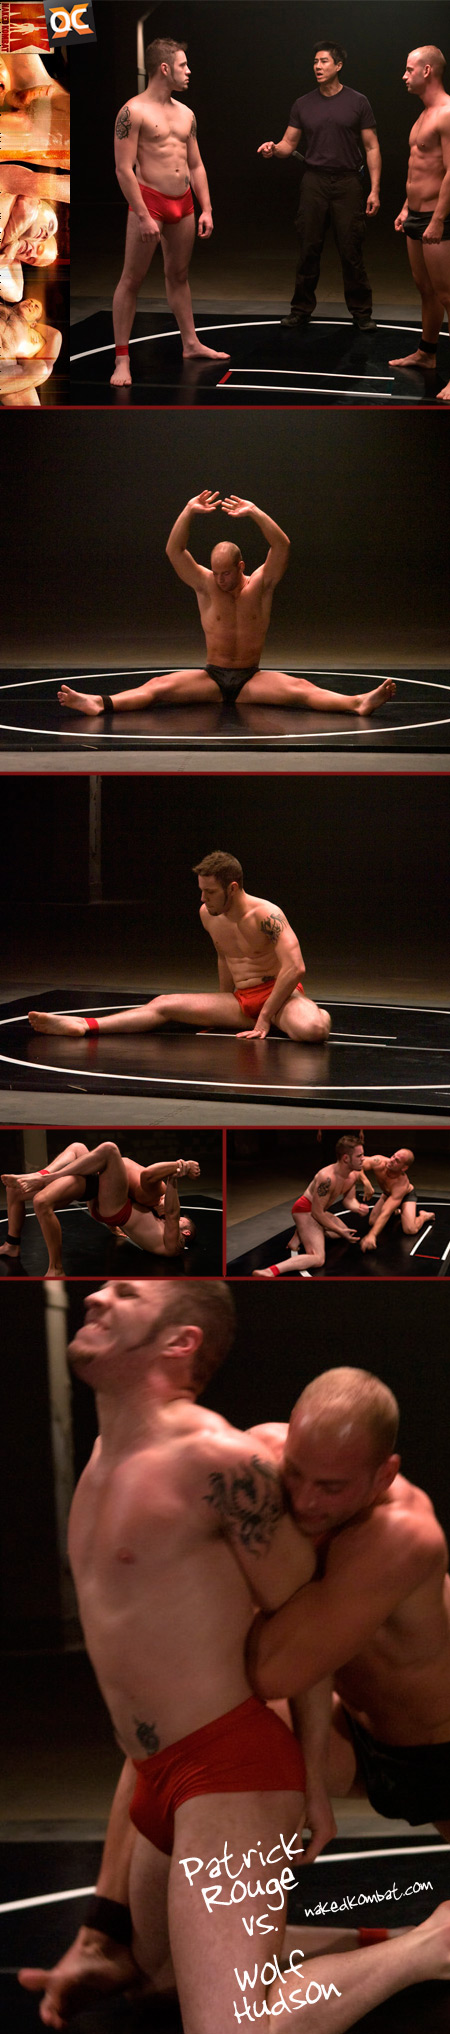 naked kombat wolf hudson patrick rouge